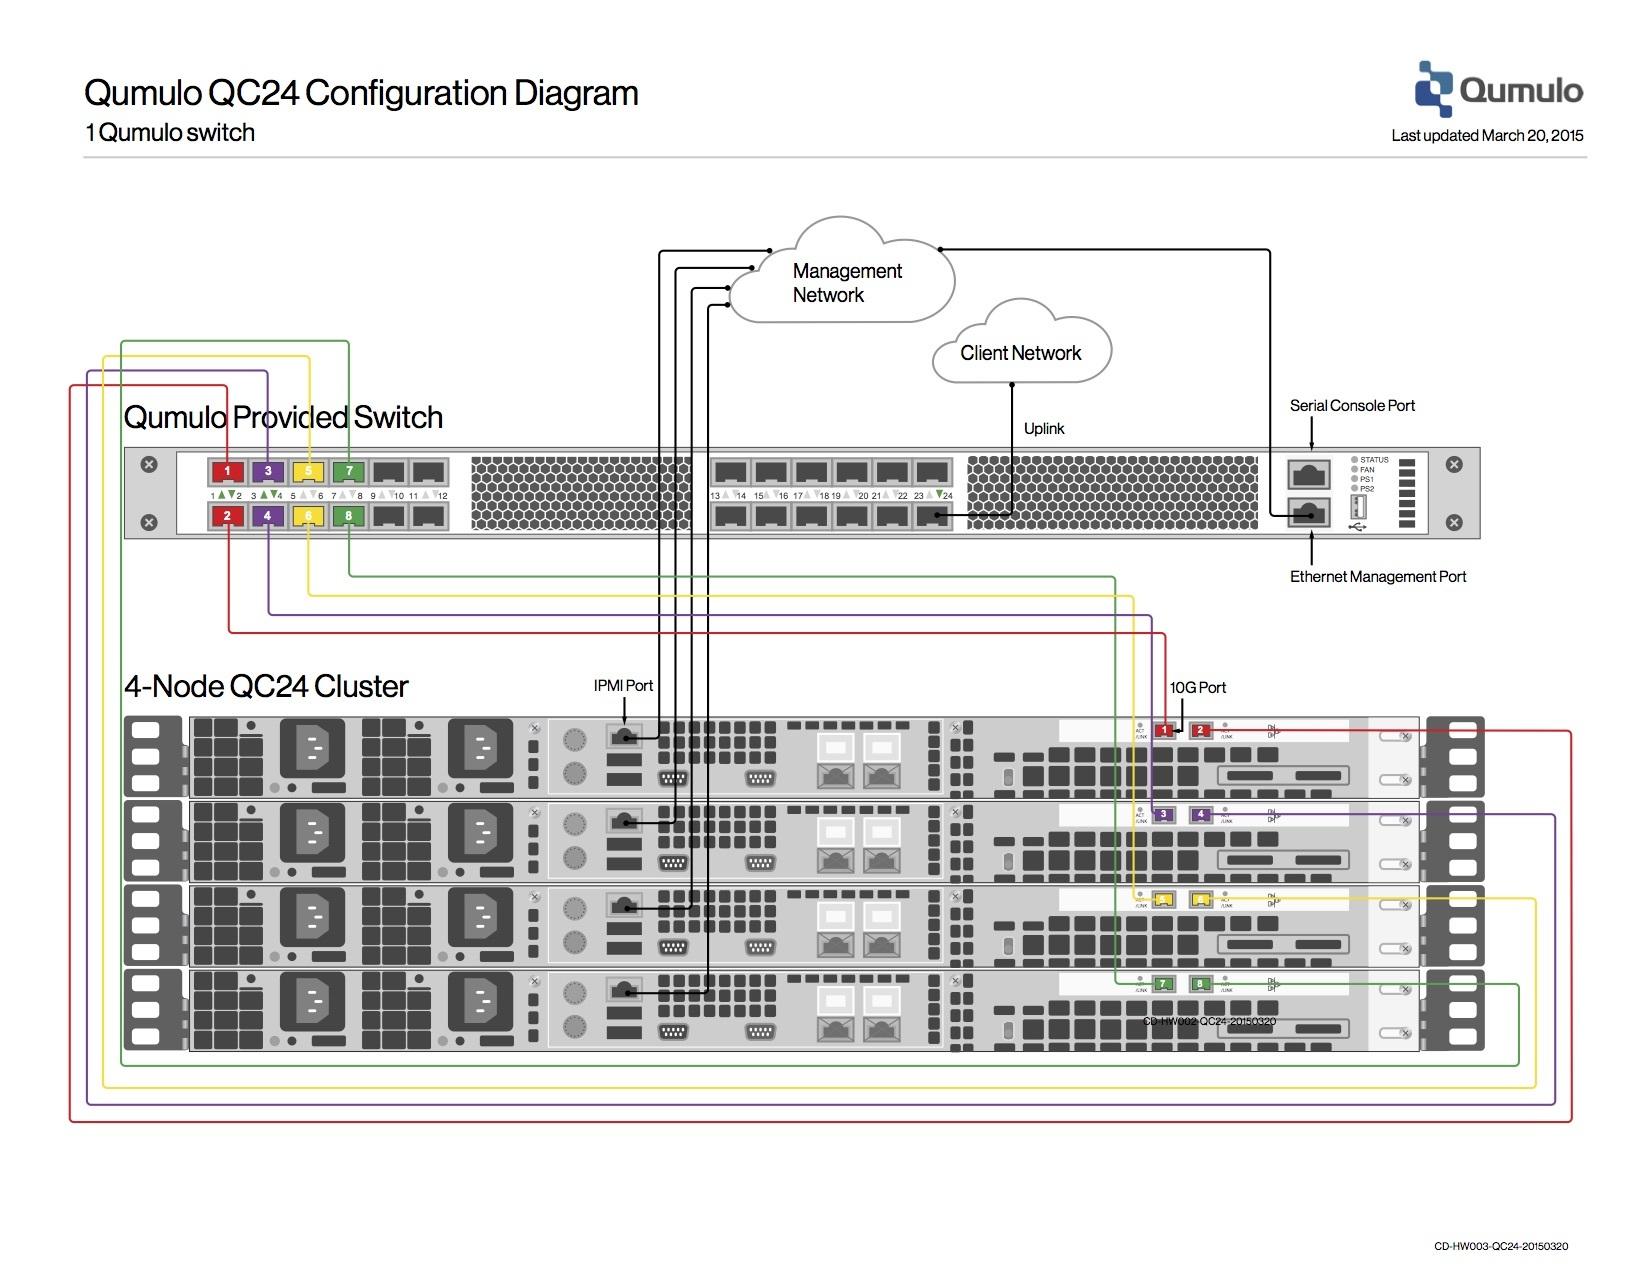 Qc24 networking diagrams qumulo care click image to enlarge sciox Gallery